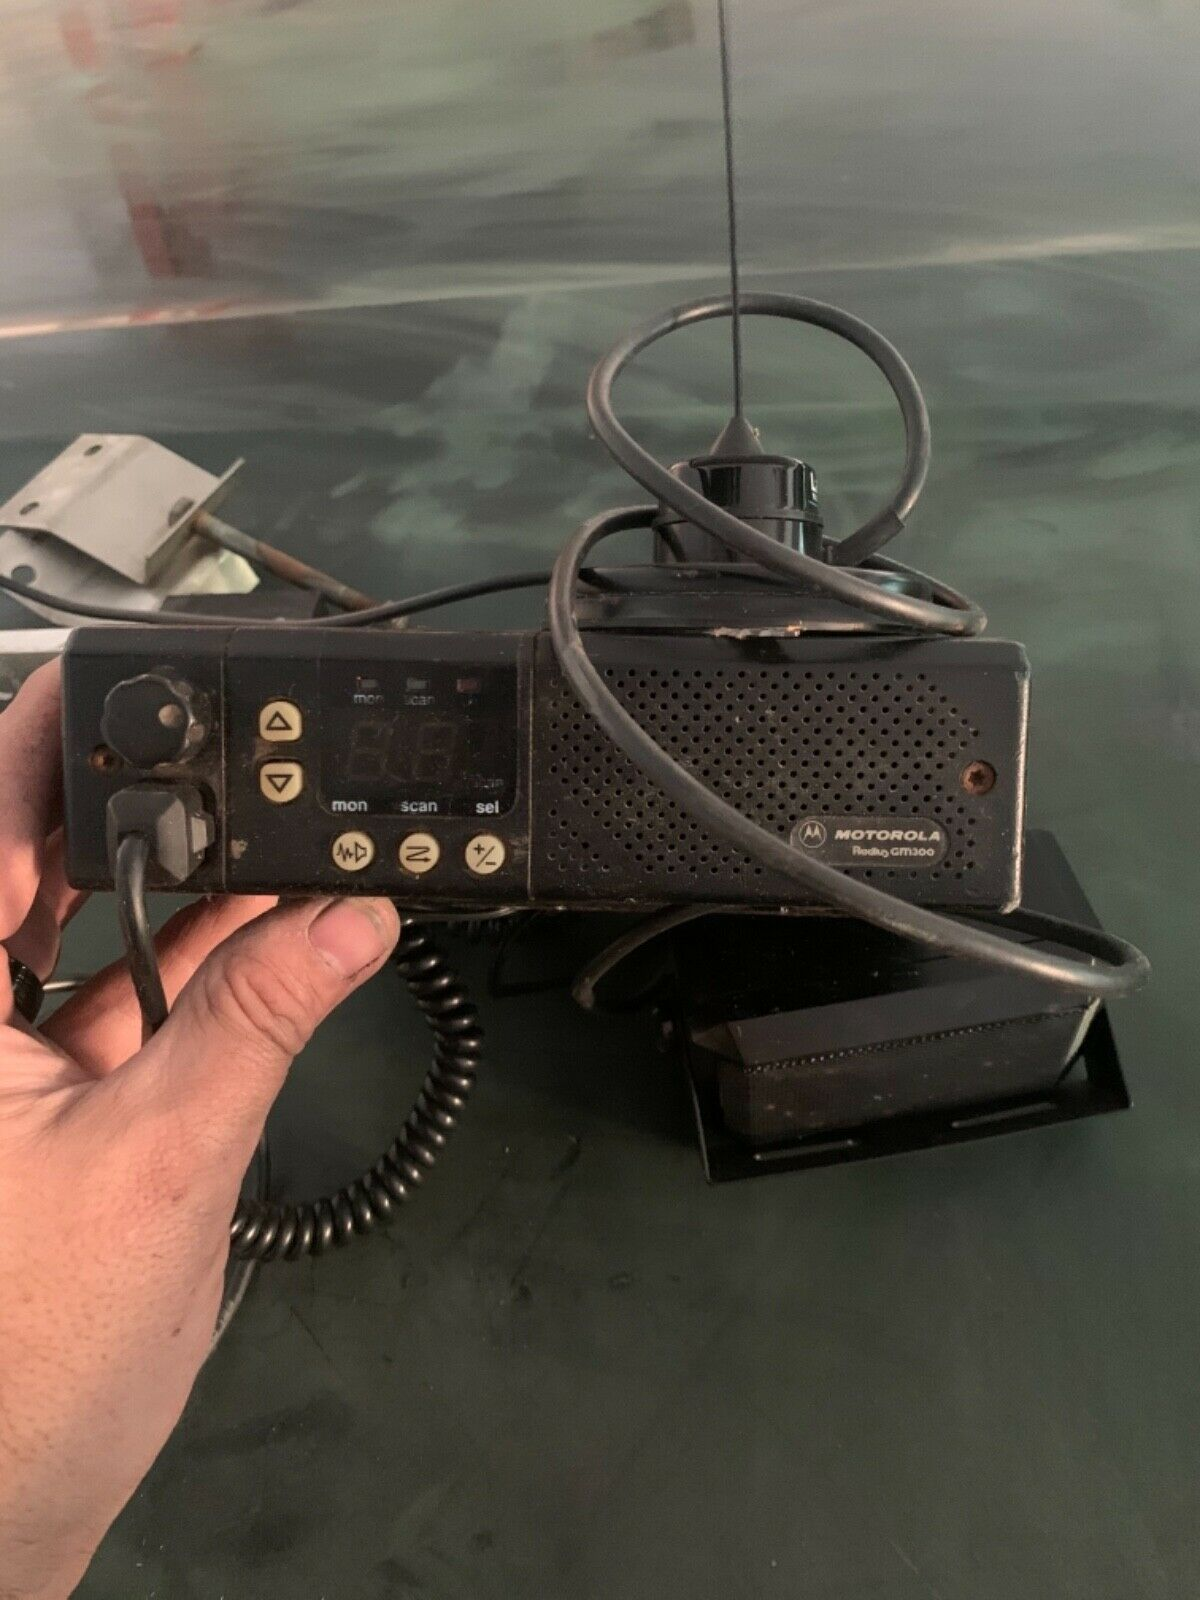 Motorola Radius GM 300 Mobile two way VHF radio. Buy it now for 100.00